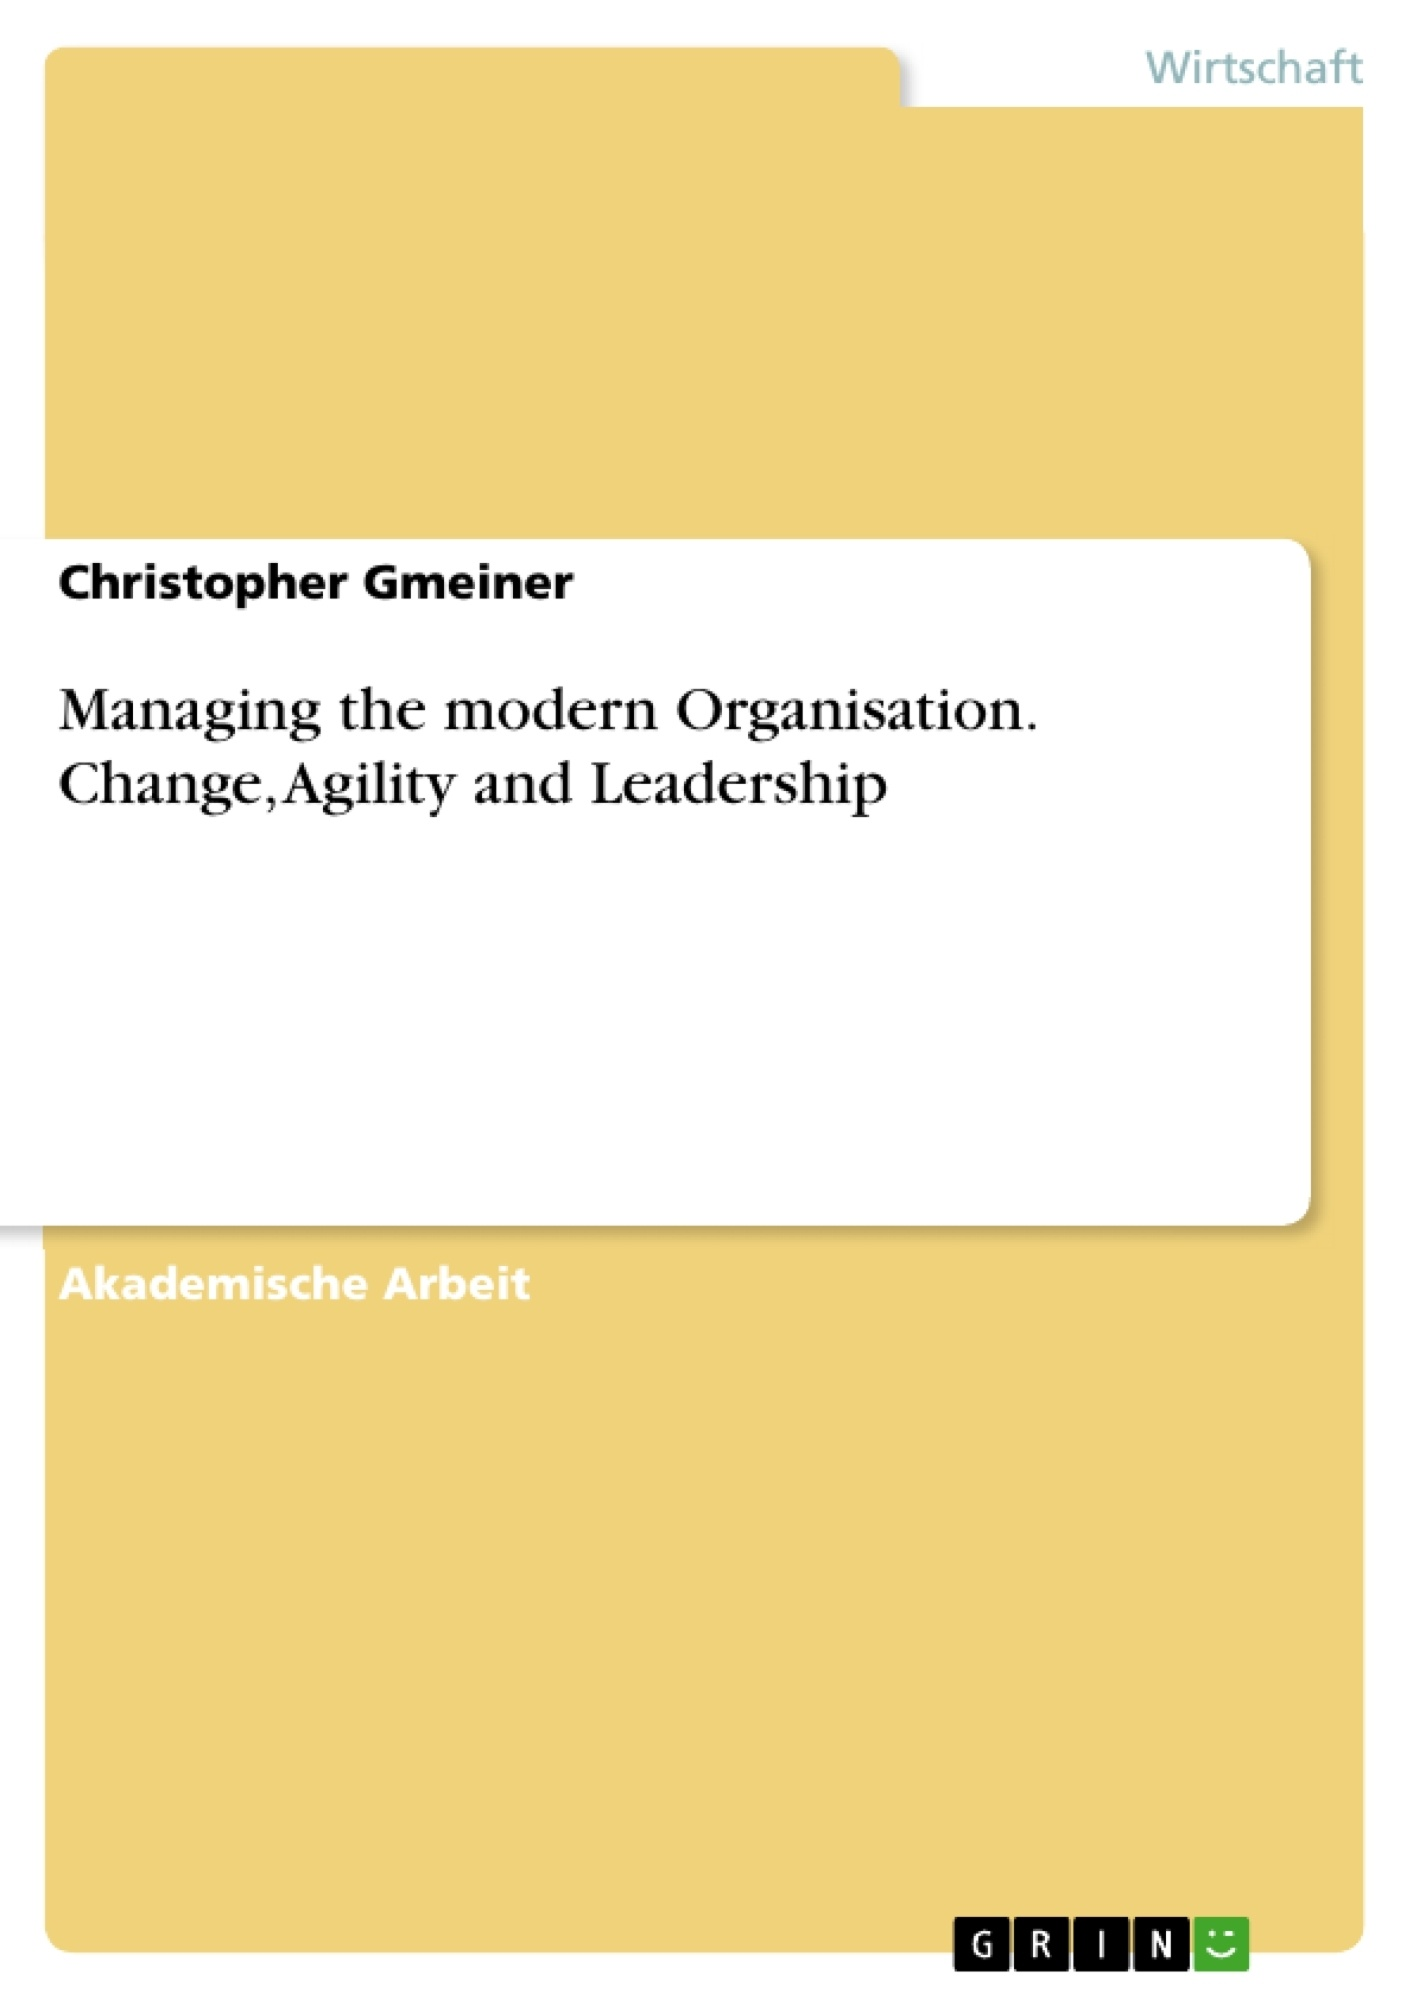 Titel: Managing the modern Organisation. Change, Agility and Leadership